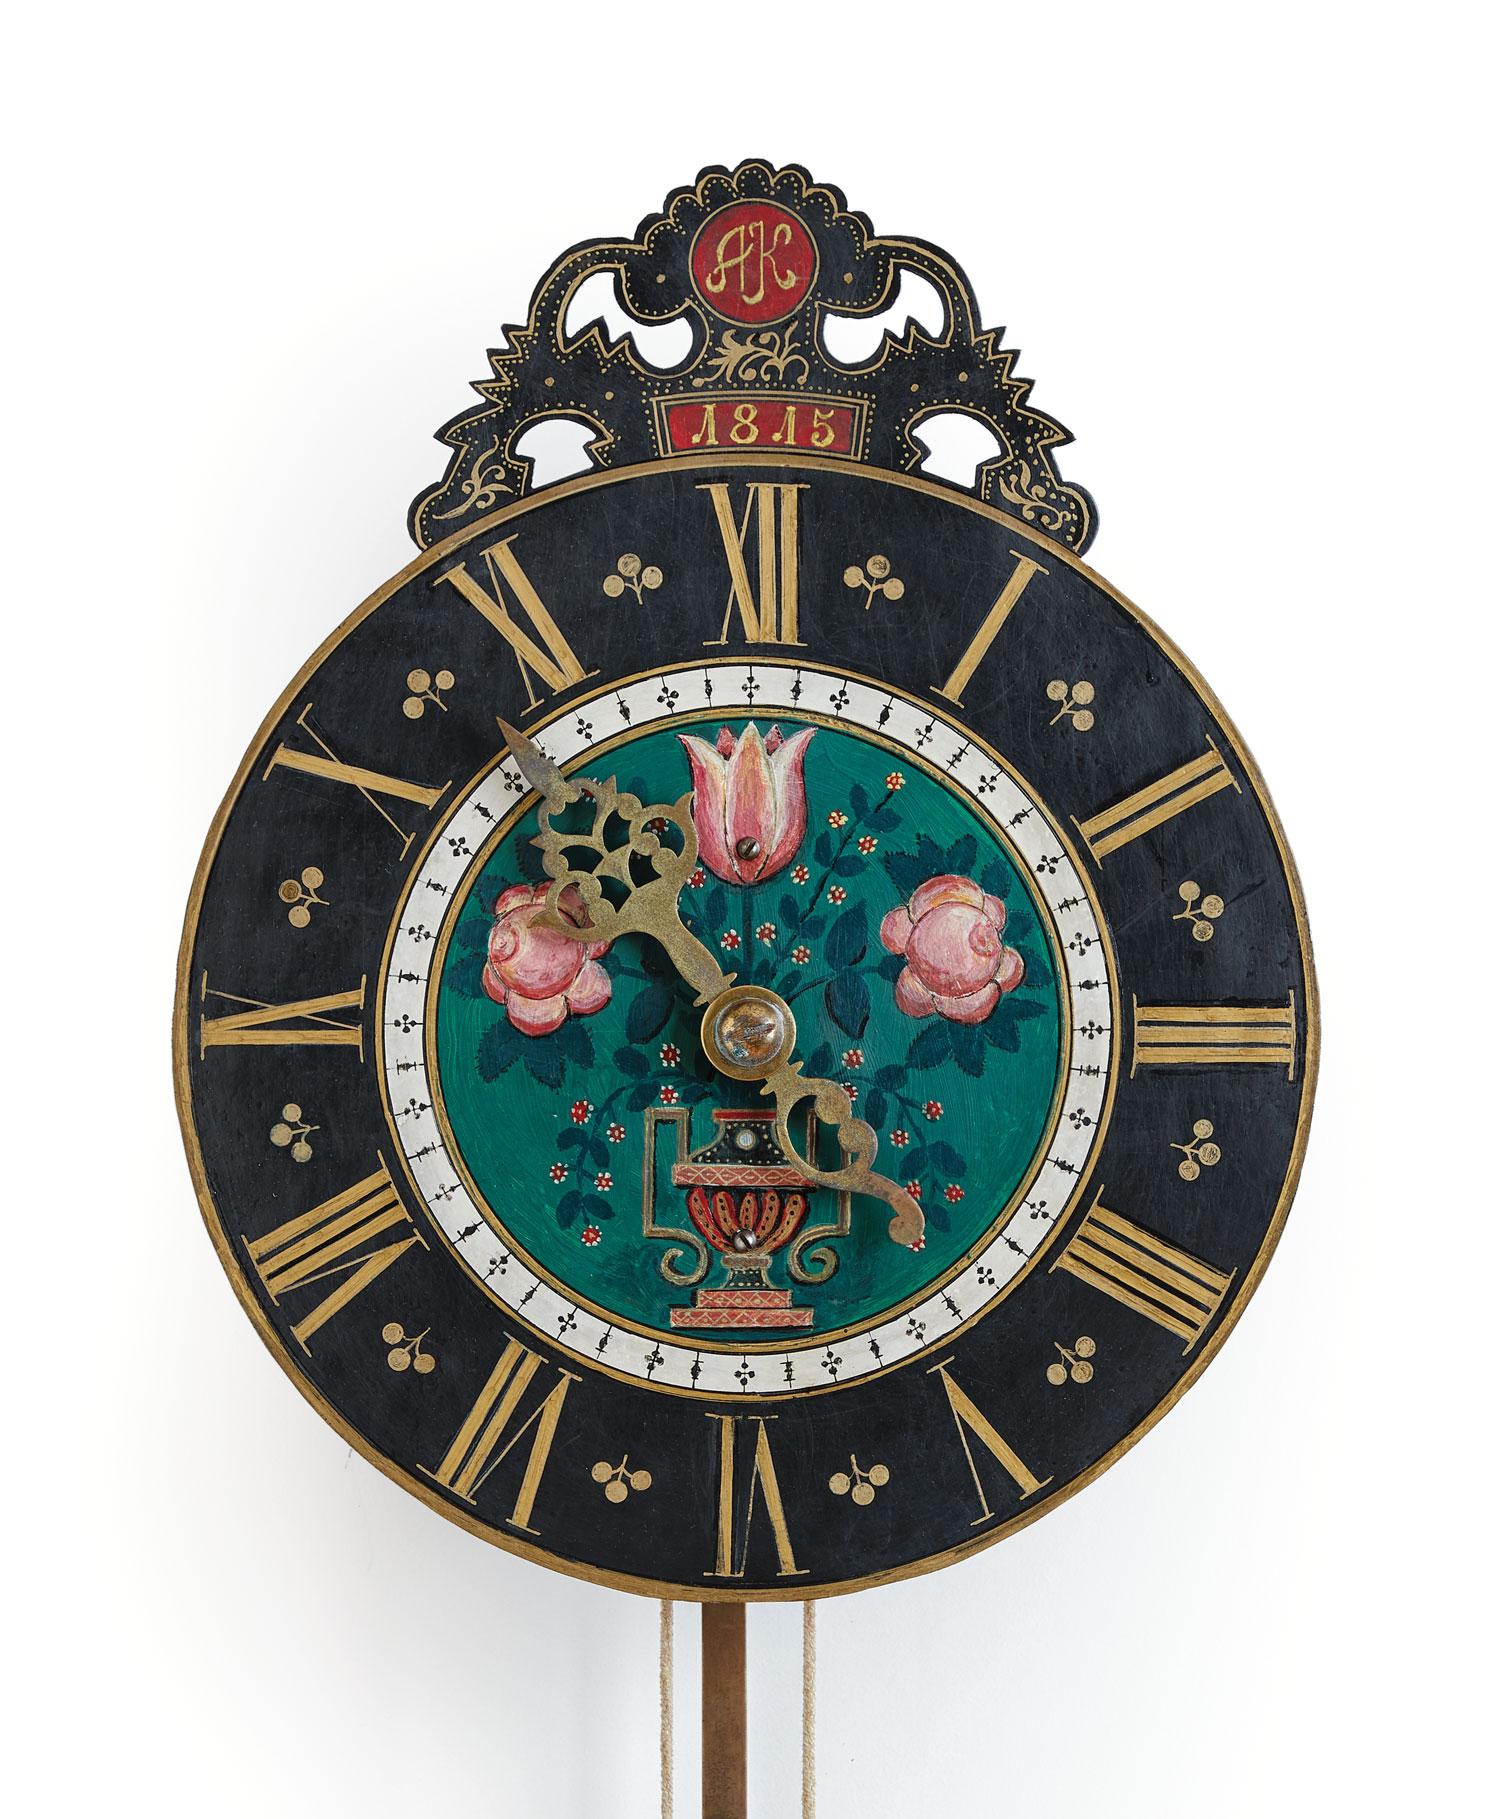 werder-clock-mennonite-kreoger-mc0008.jpg